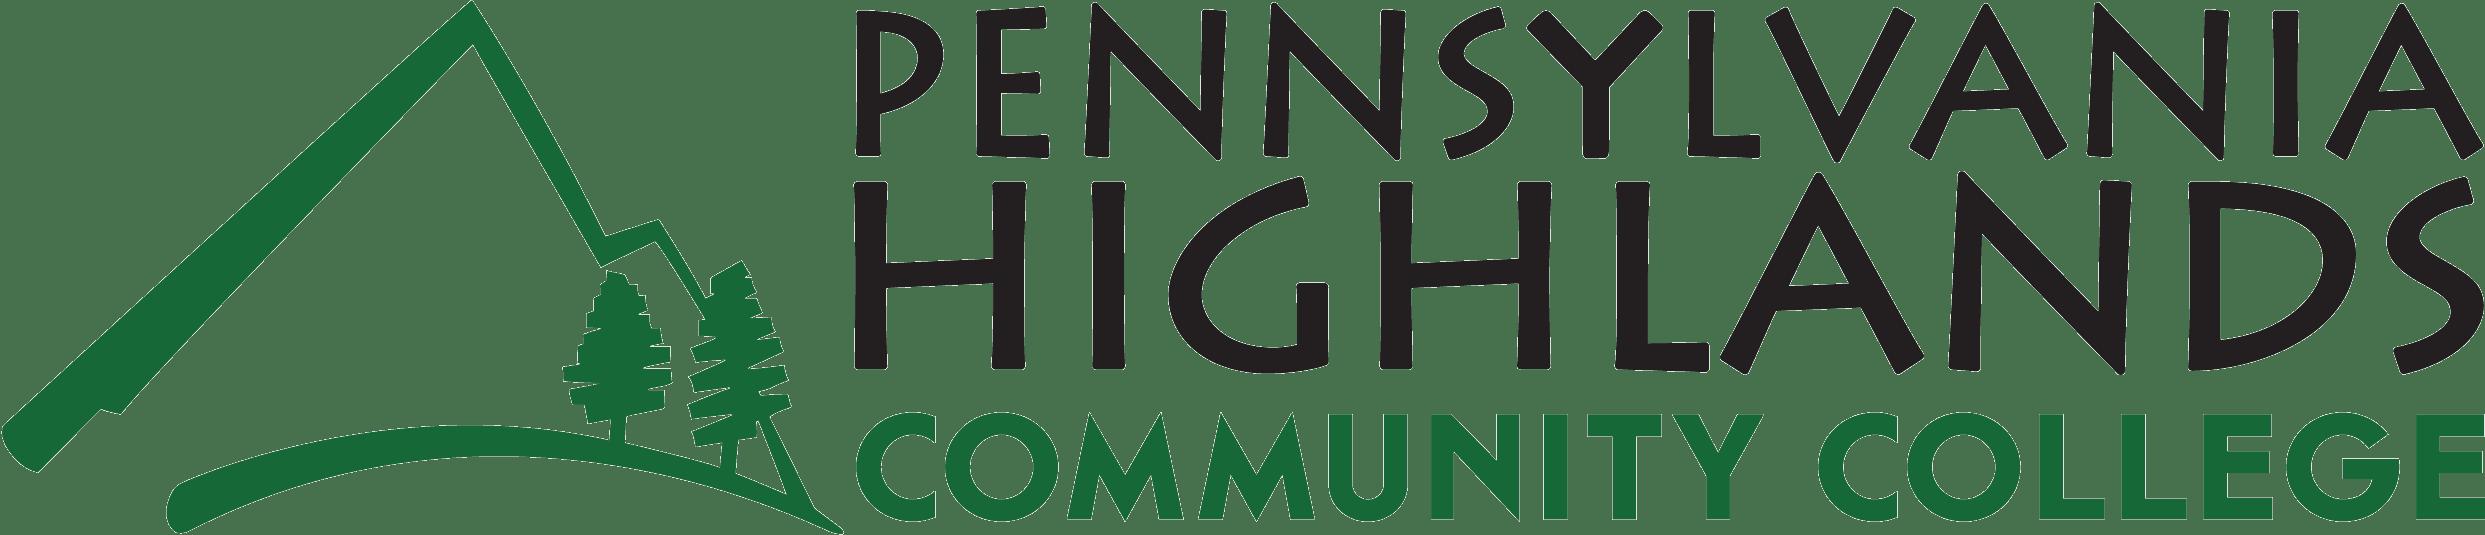 pennsylvania highlands community college logo 53175